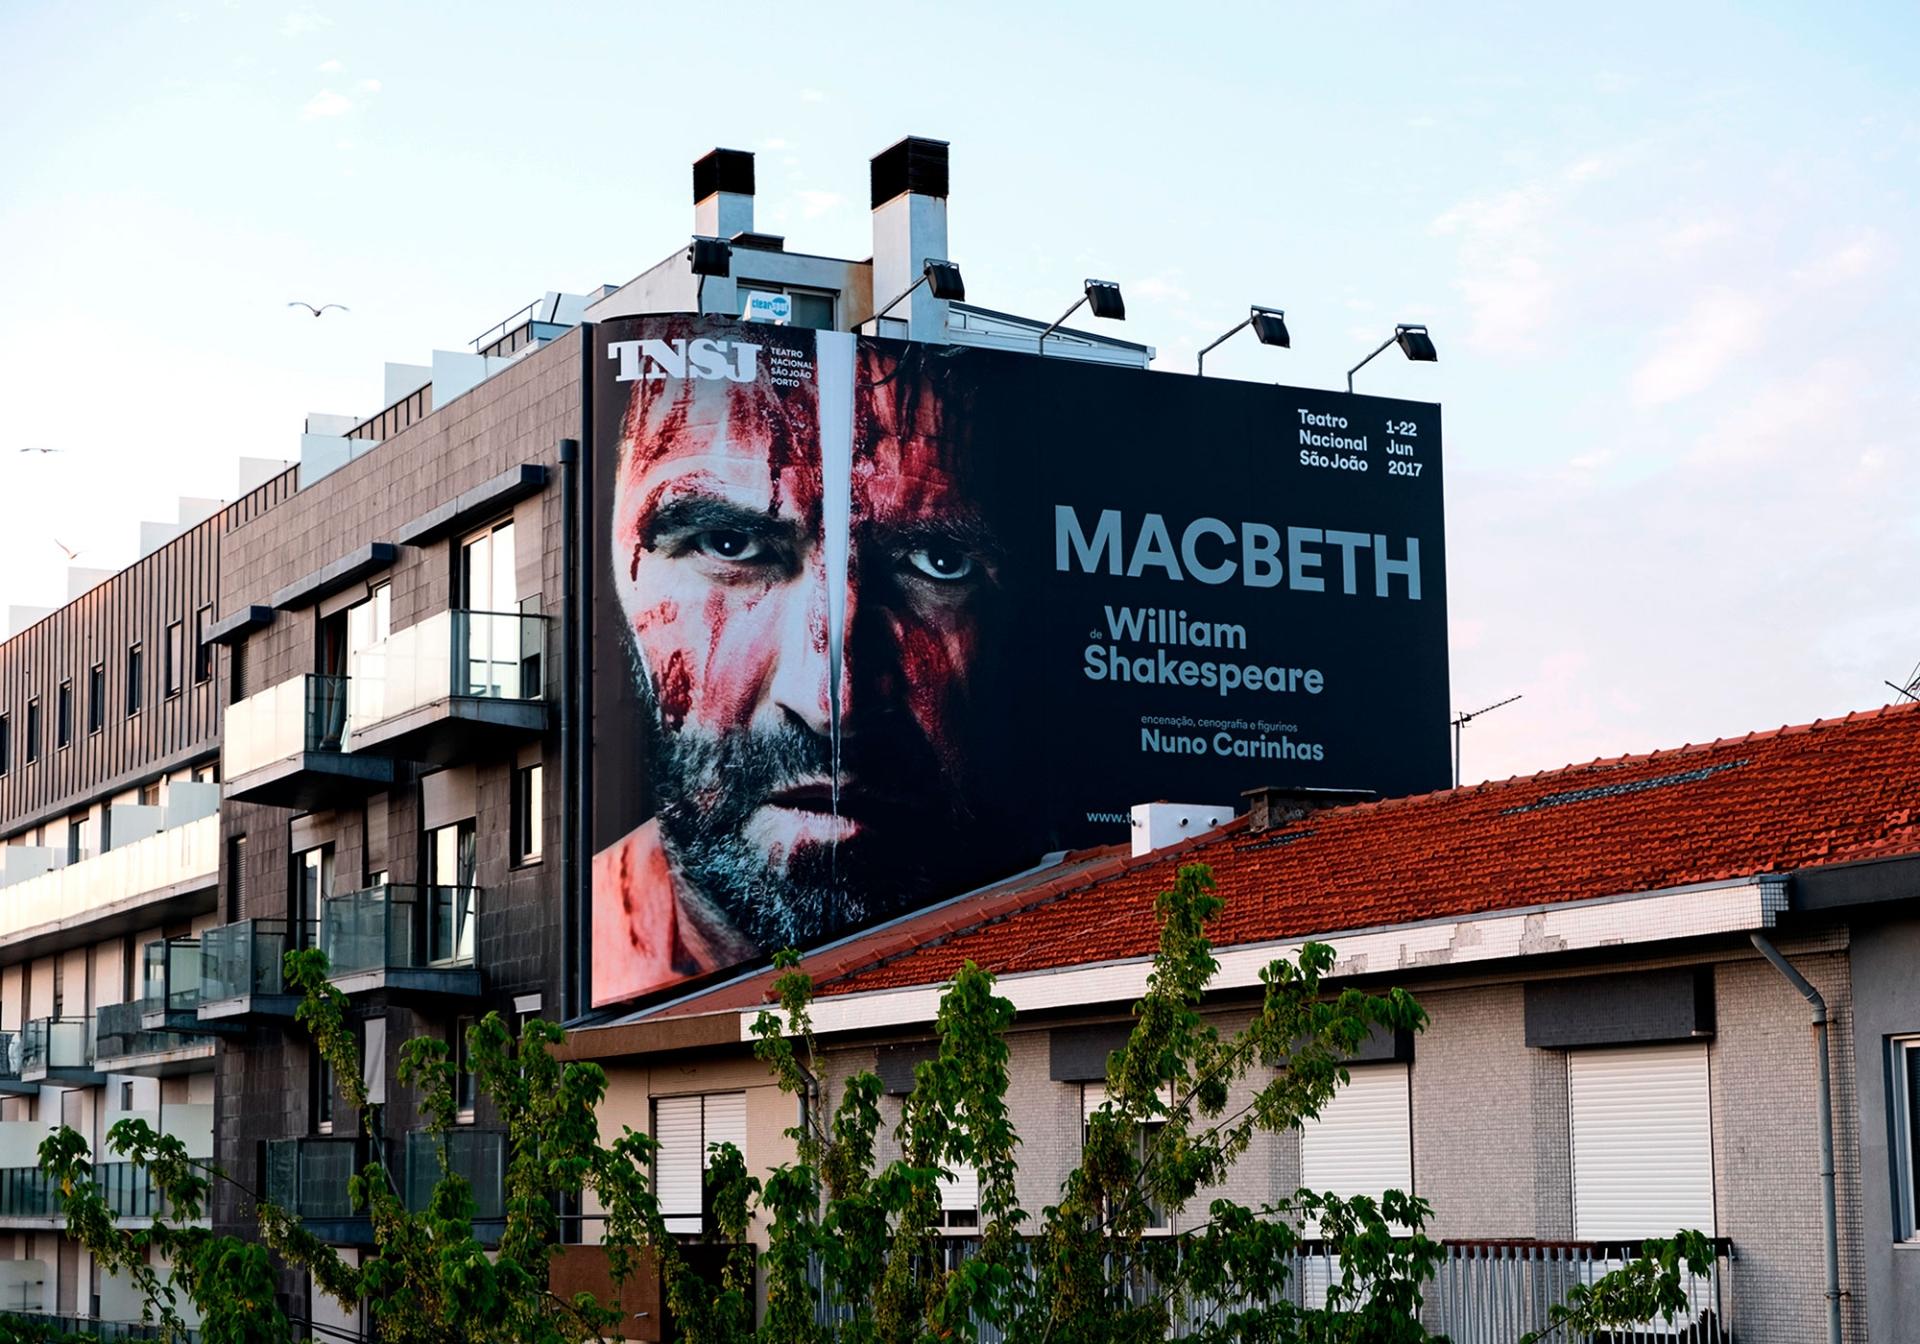 São João National Theatre Posters 2017-2018 Image:9 dobra-tnsj-Macbeth-01